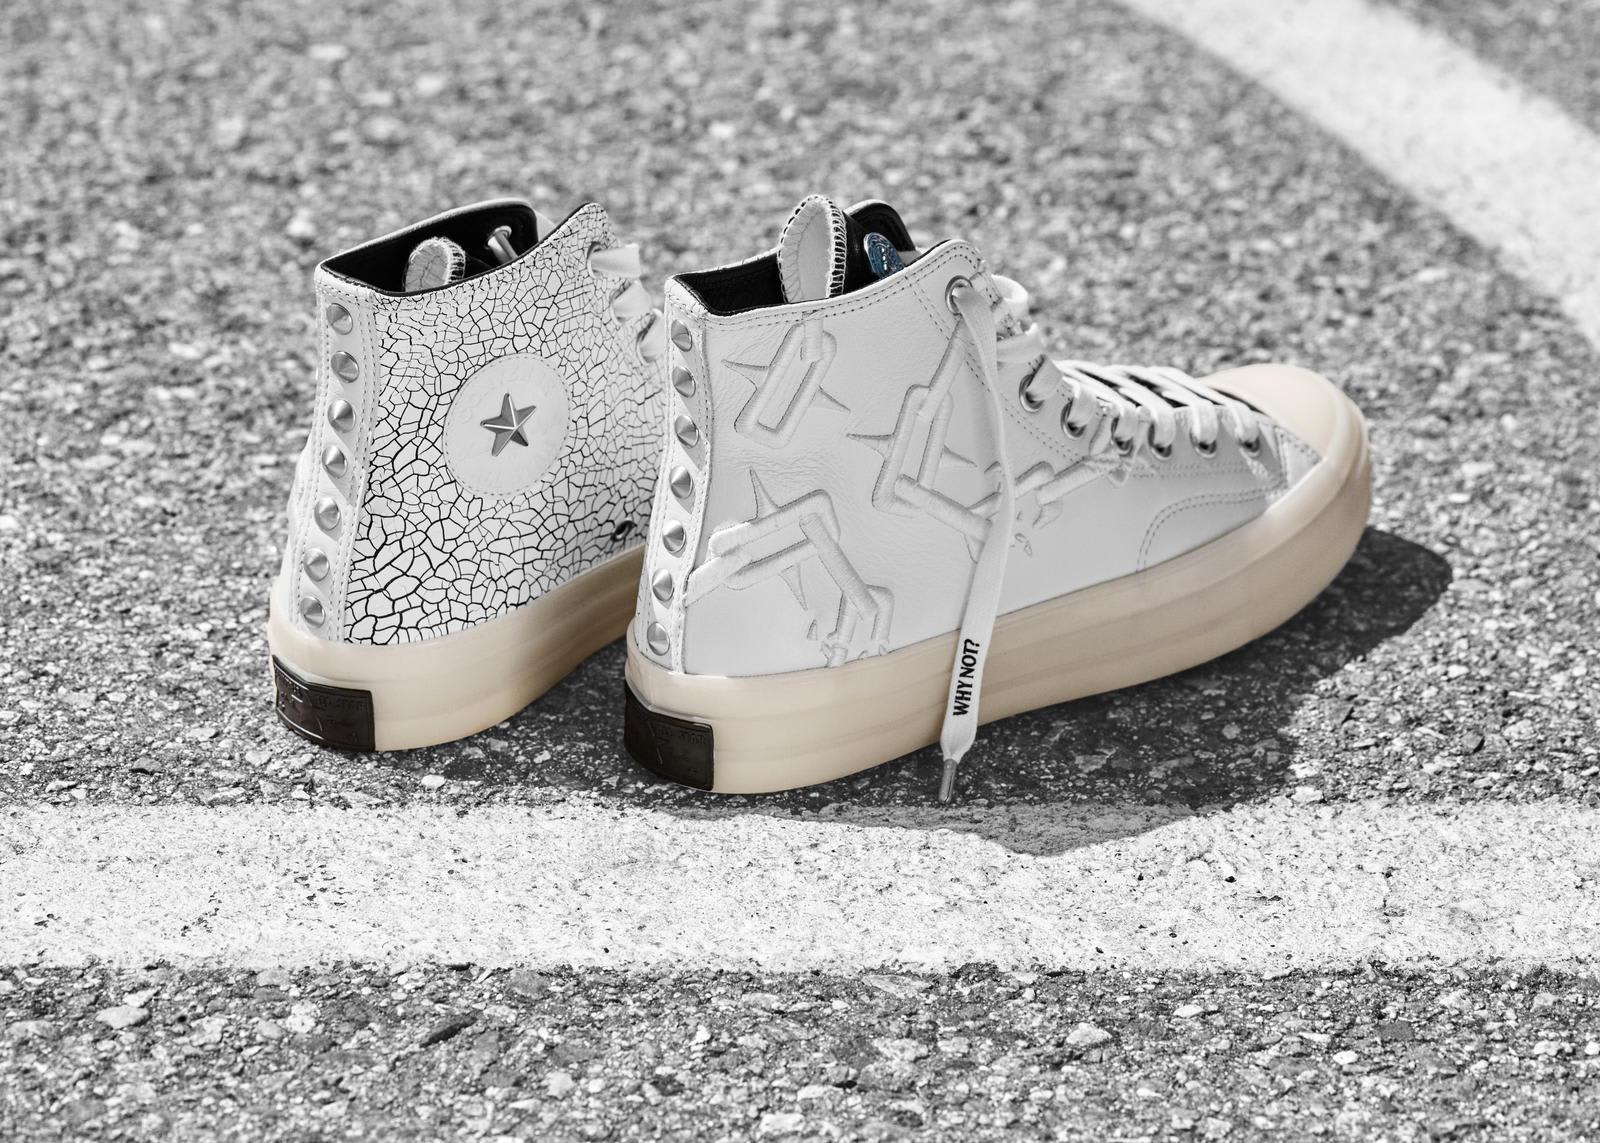 Jordan x Converse Chuck 70 'Why Not?' Pack Heel